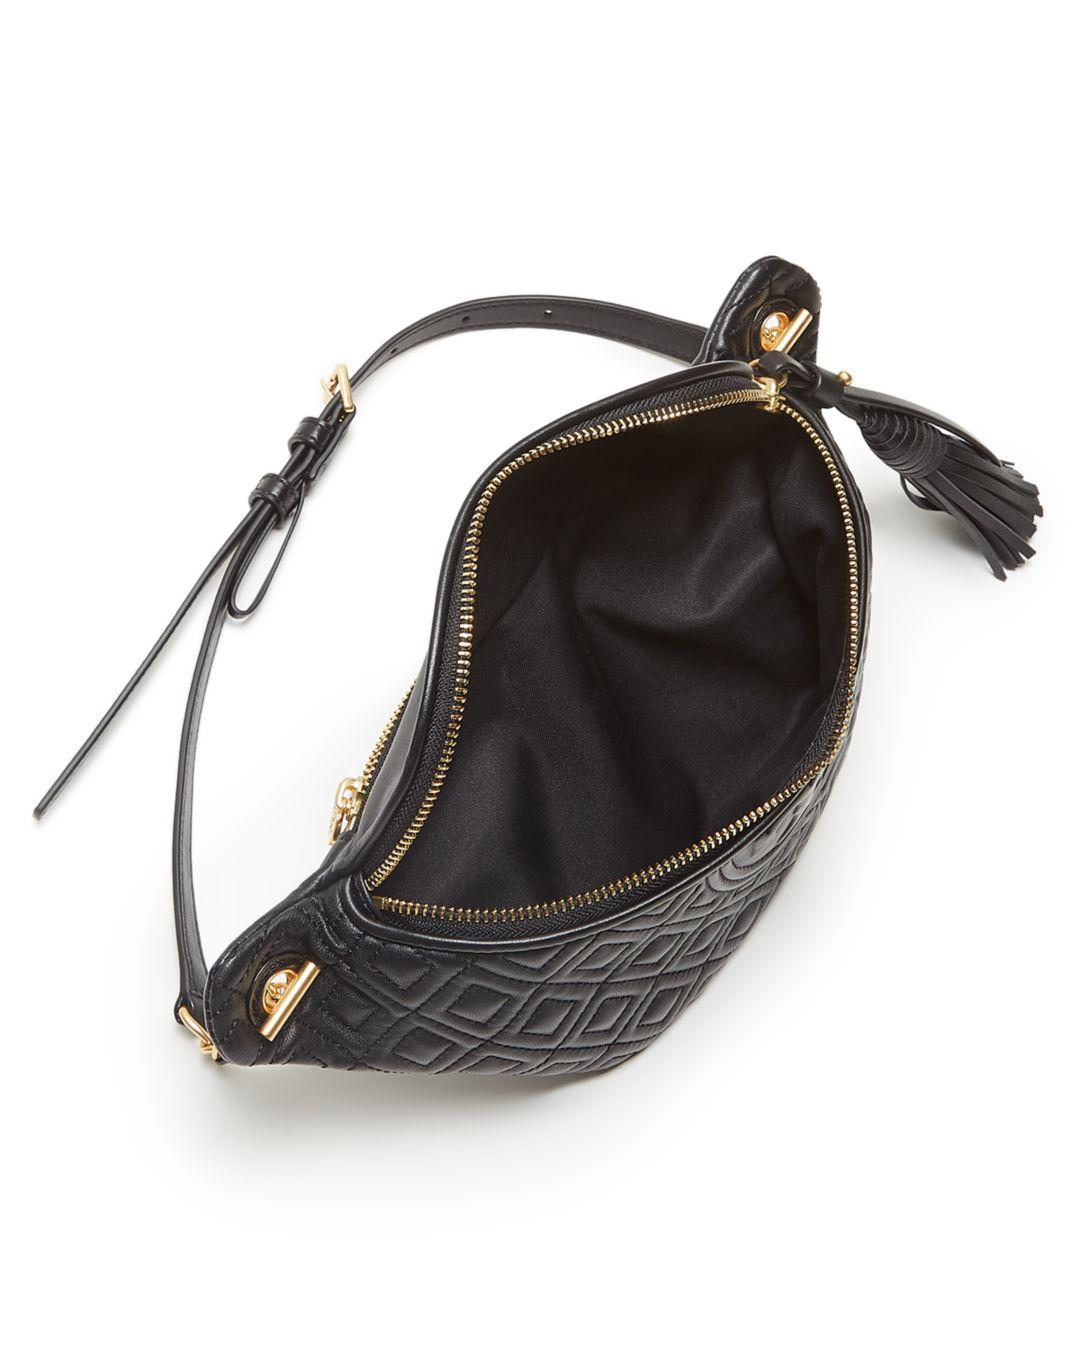 6090a27626a9 Tory Burch - Black Fleming Leather Belt Bag - Lyst. View fullscreen